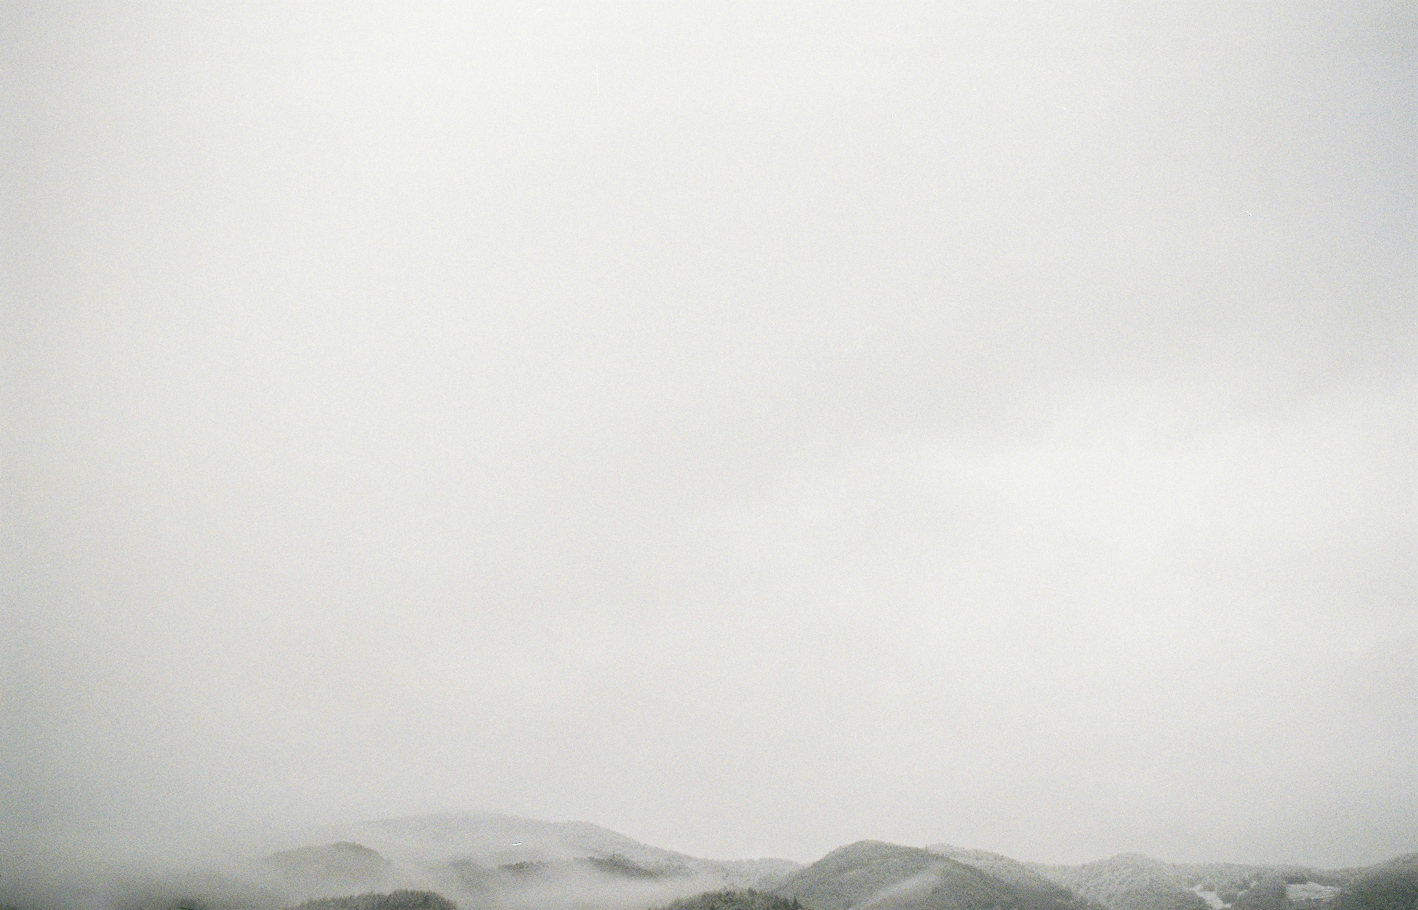 011-kawaguchiko-mount-fuji-japan-sophie-baker-photography